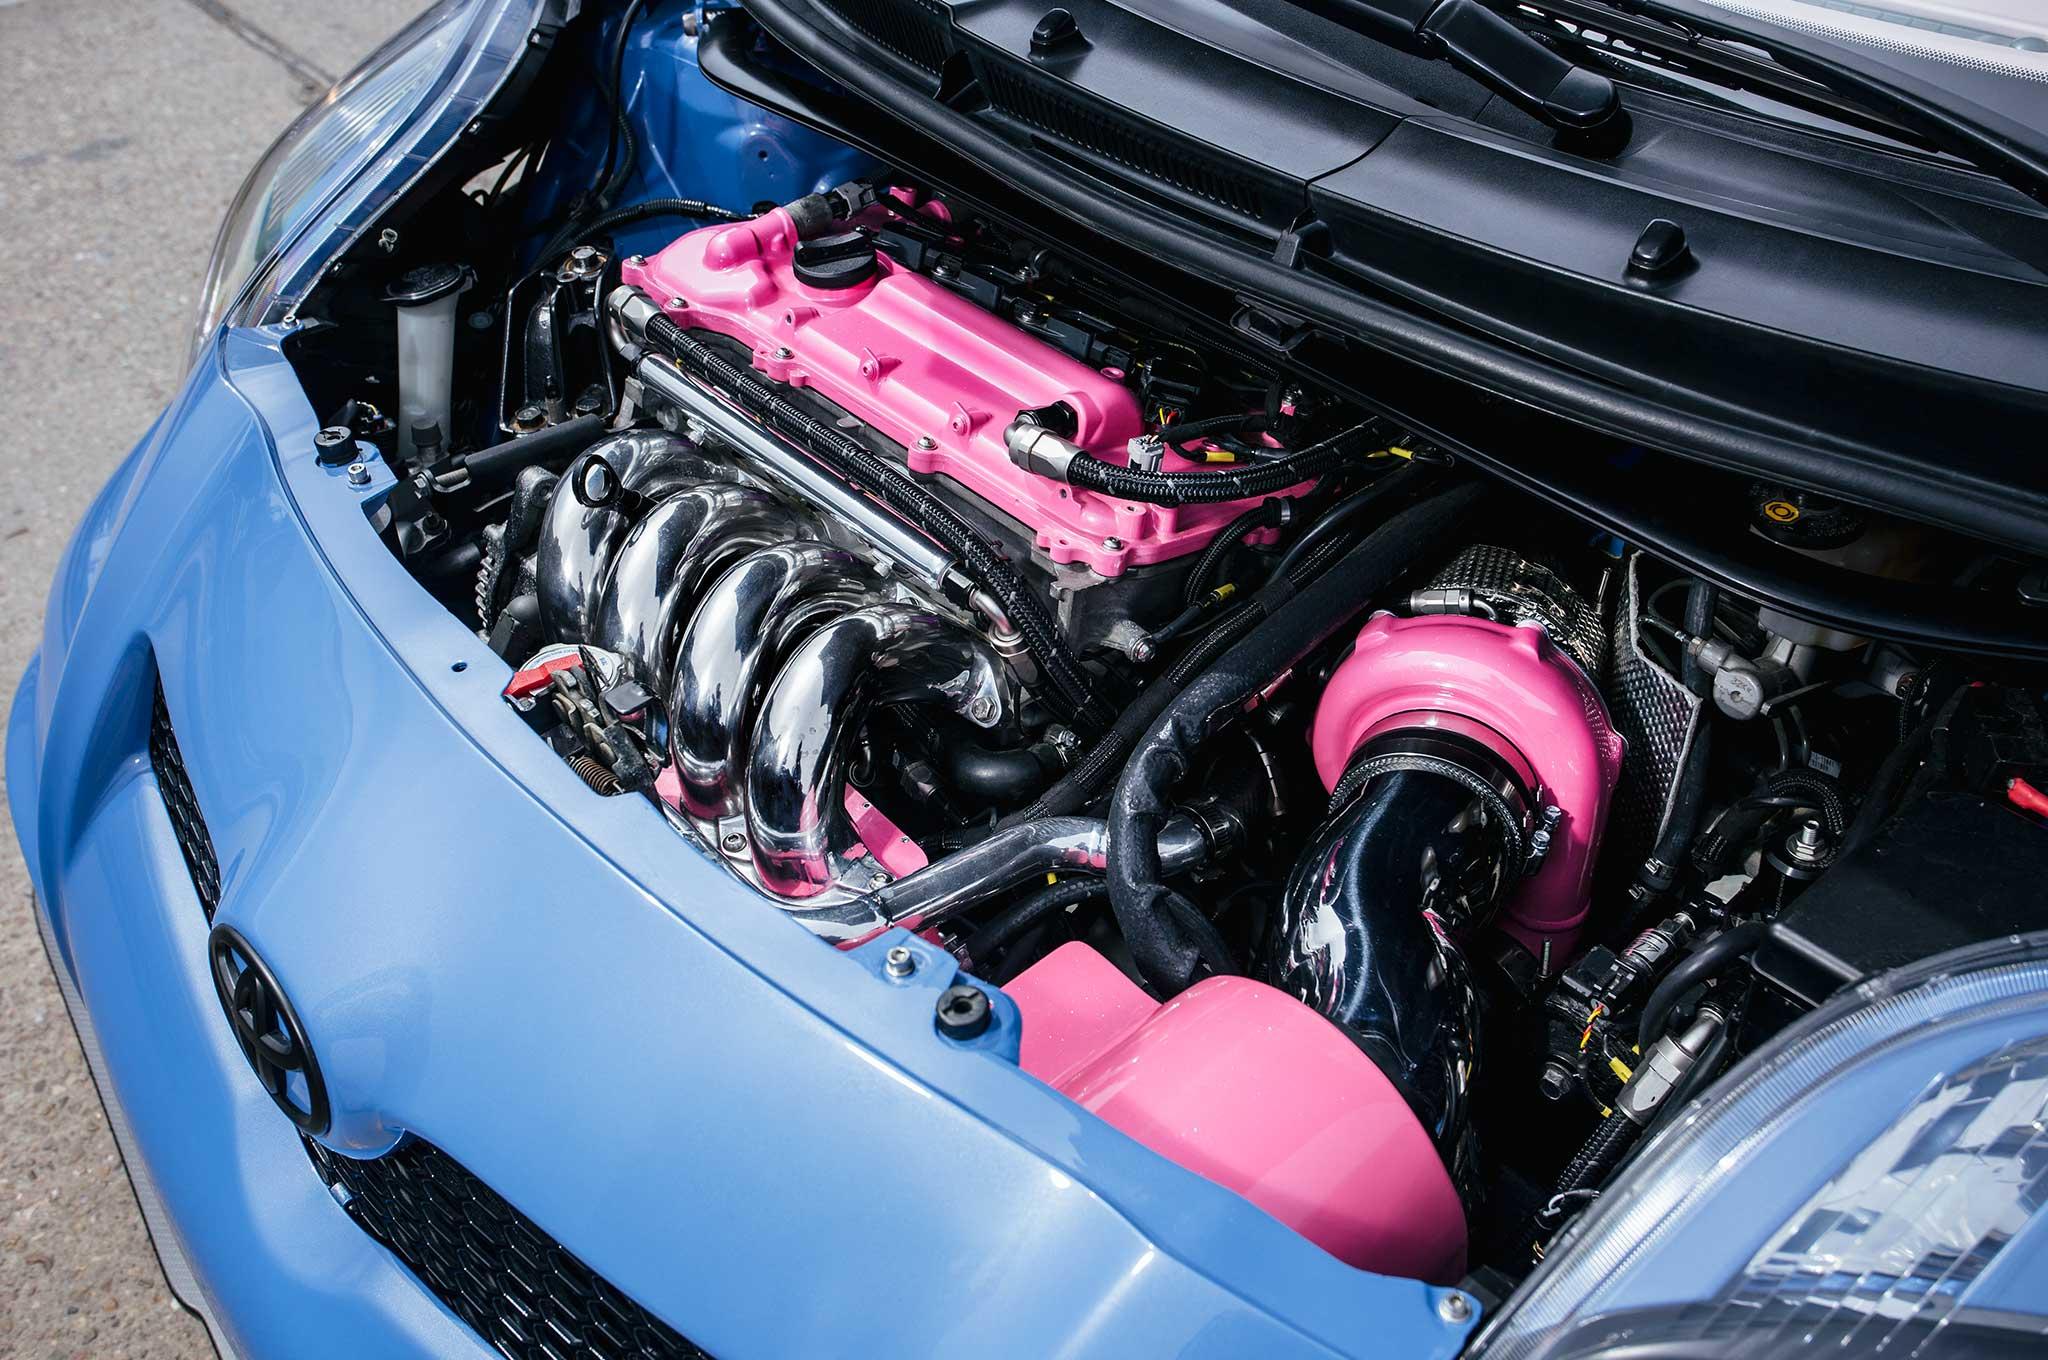 [DIAGRAM_5UK]  2007 Toyota Yaris - Ain't No Joke | 2007 Toyota Yaris Engine Diagram |  | Super Street